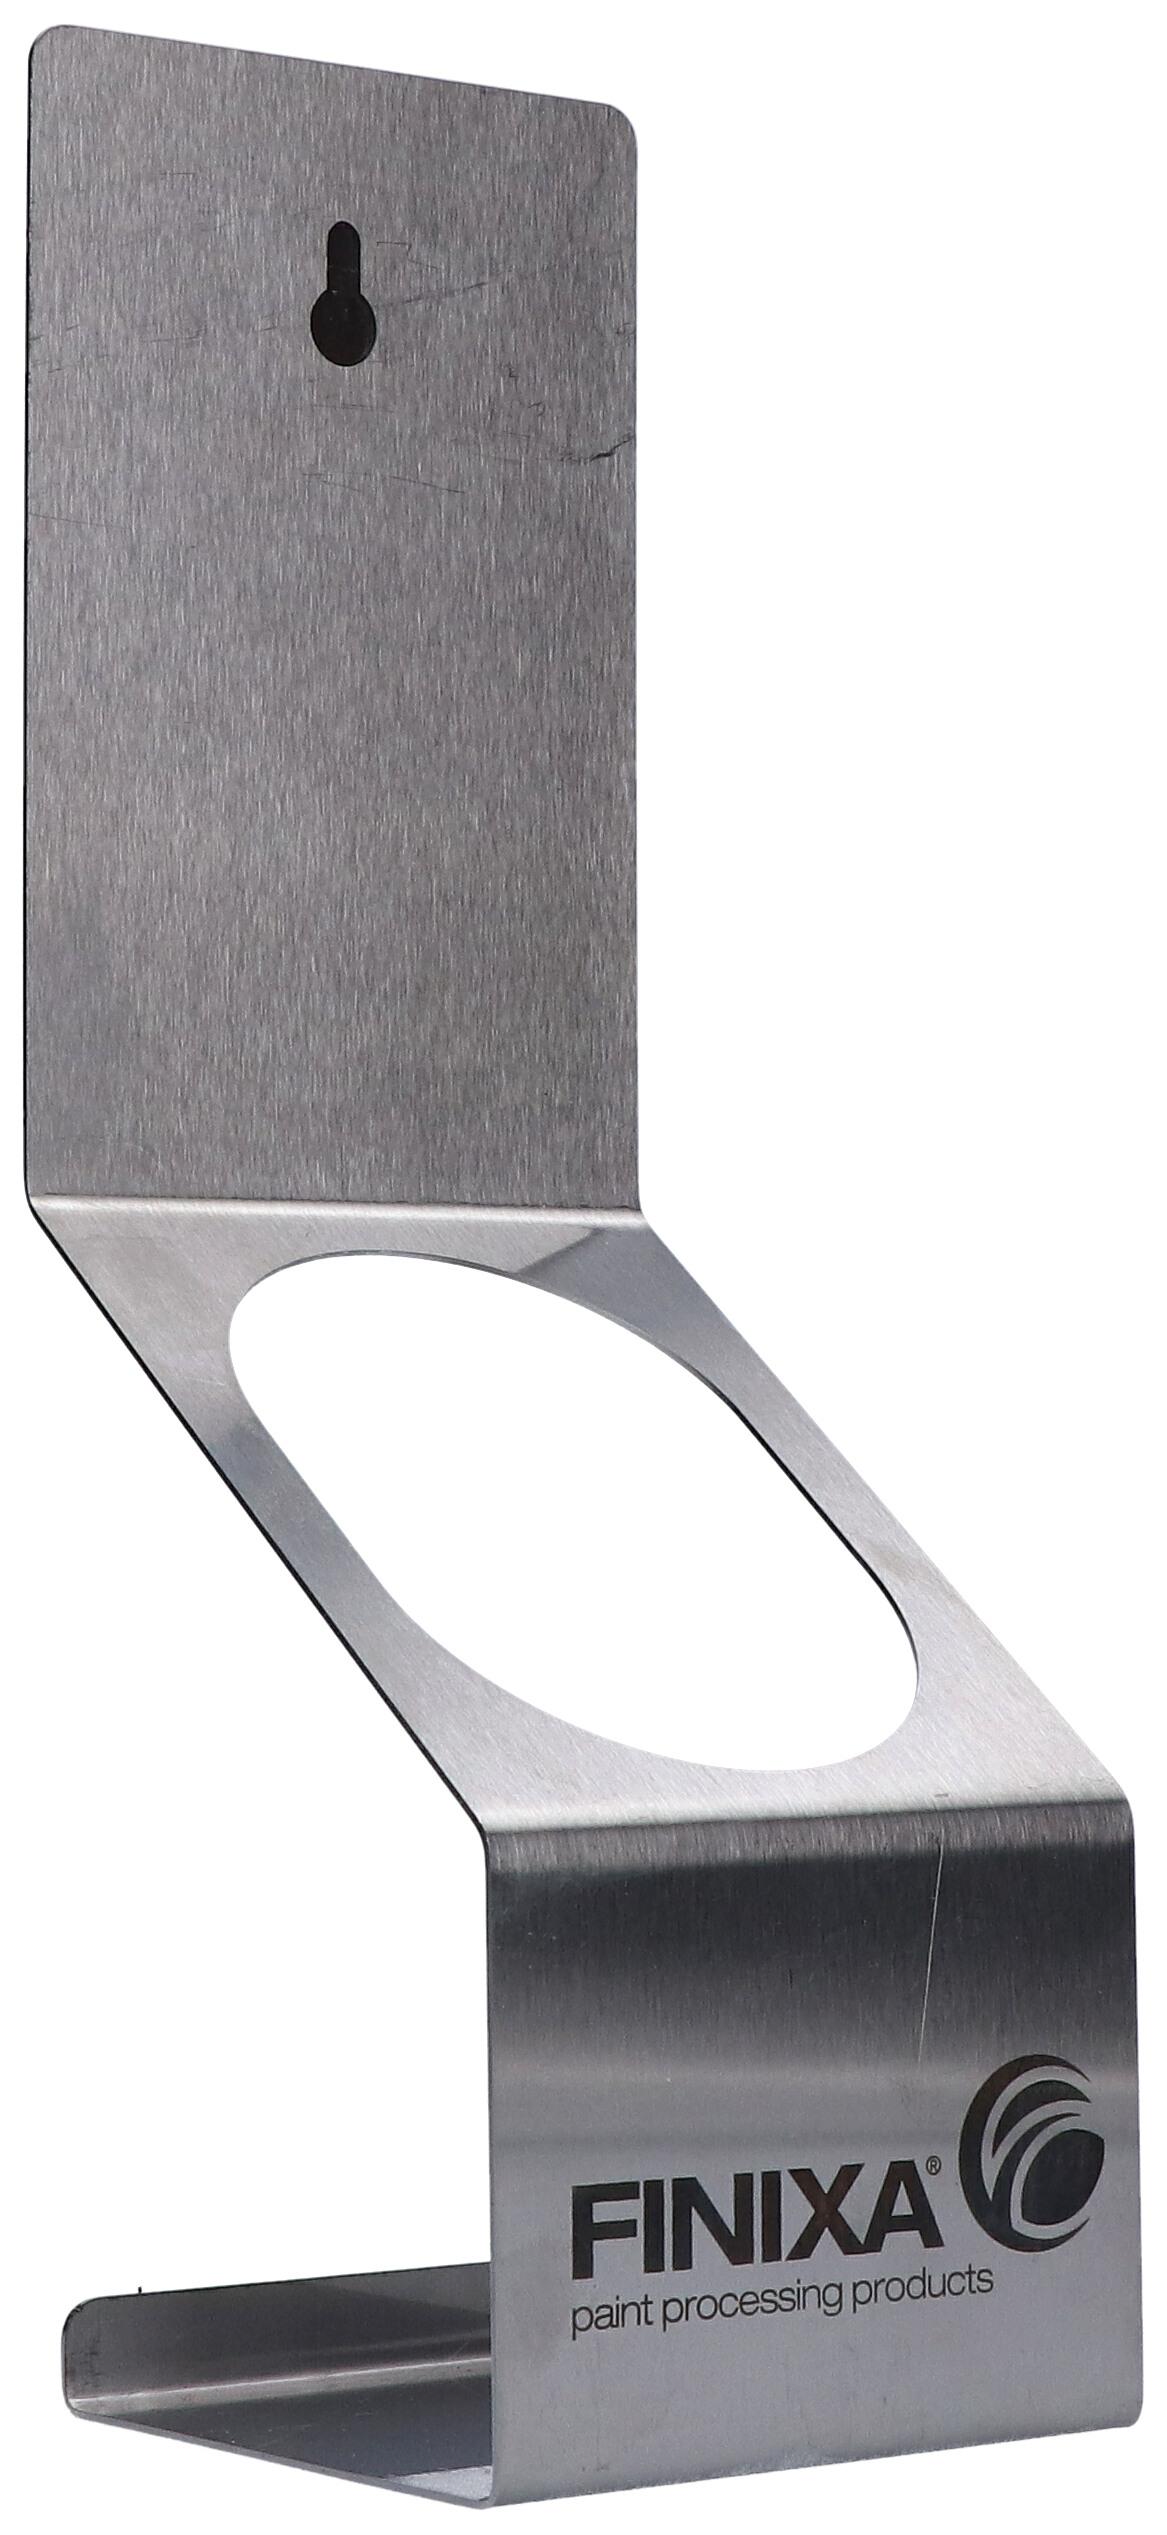 Magnetic aerosol holder